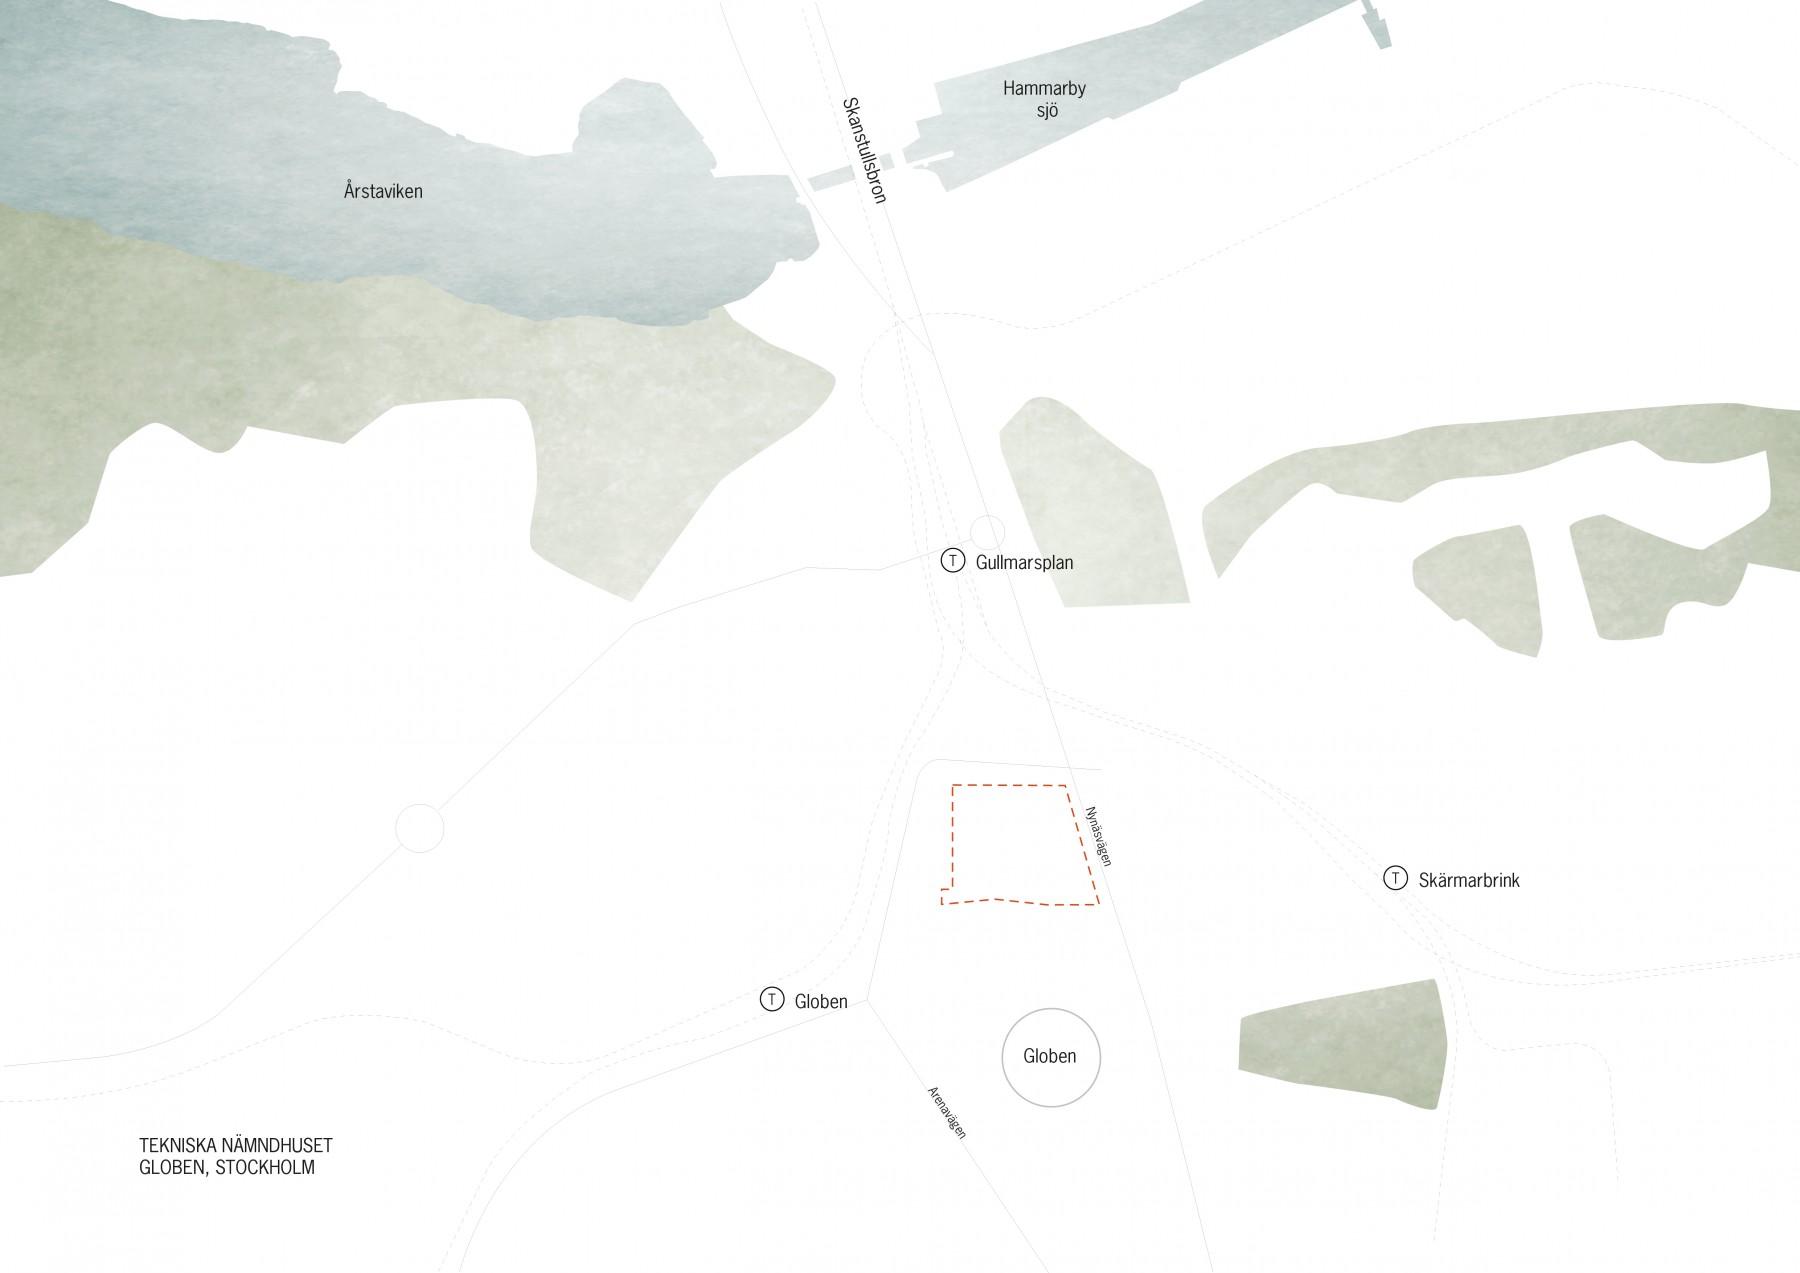 Tekniska_Namndhuset_LAND_2014_karta (2)-01